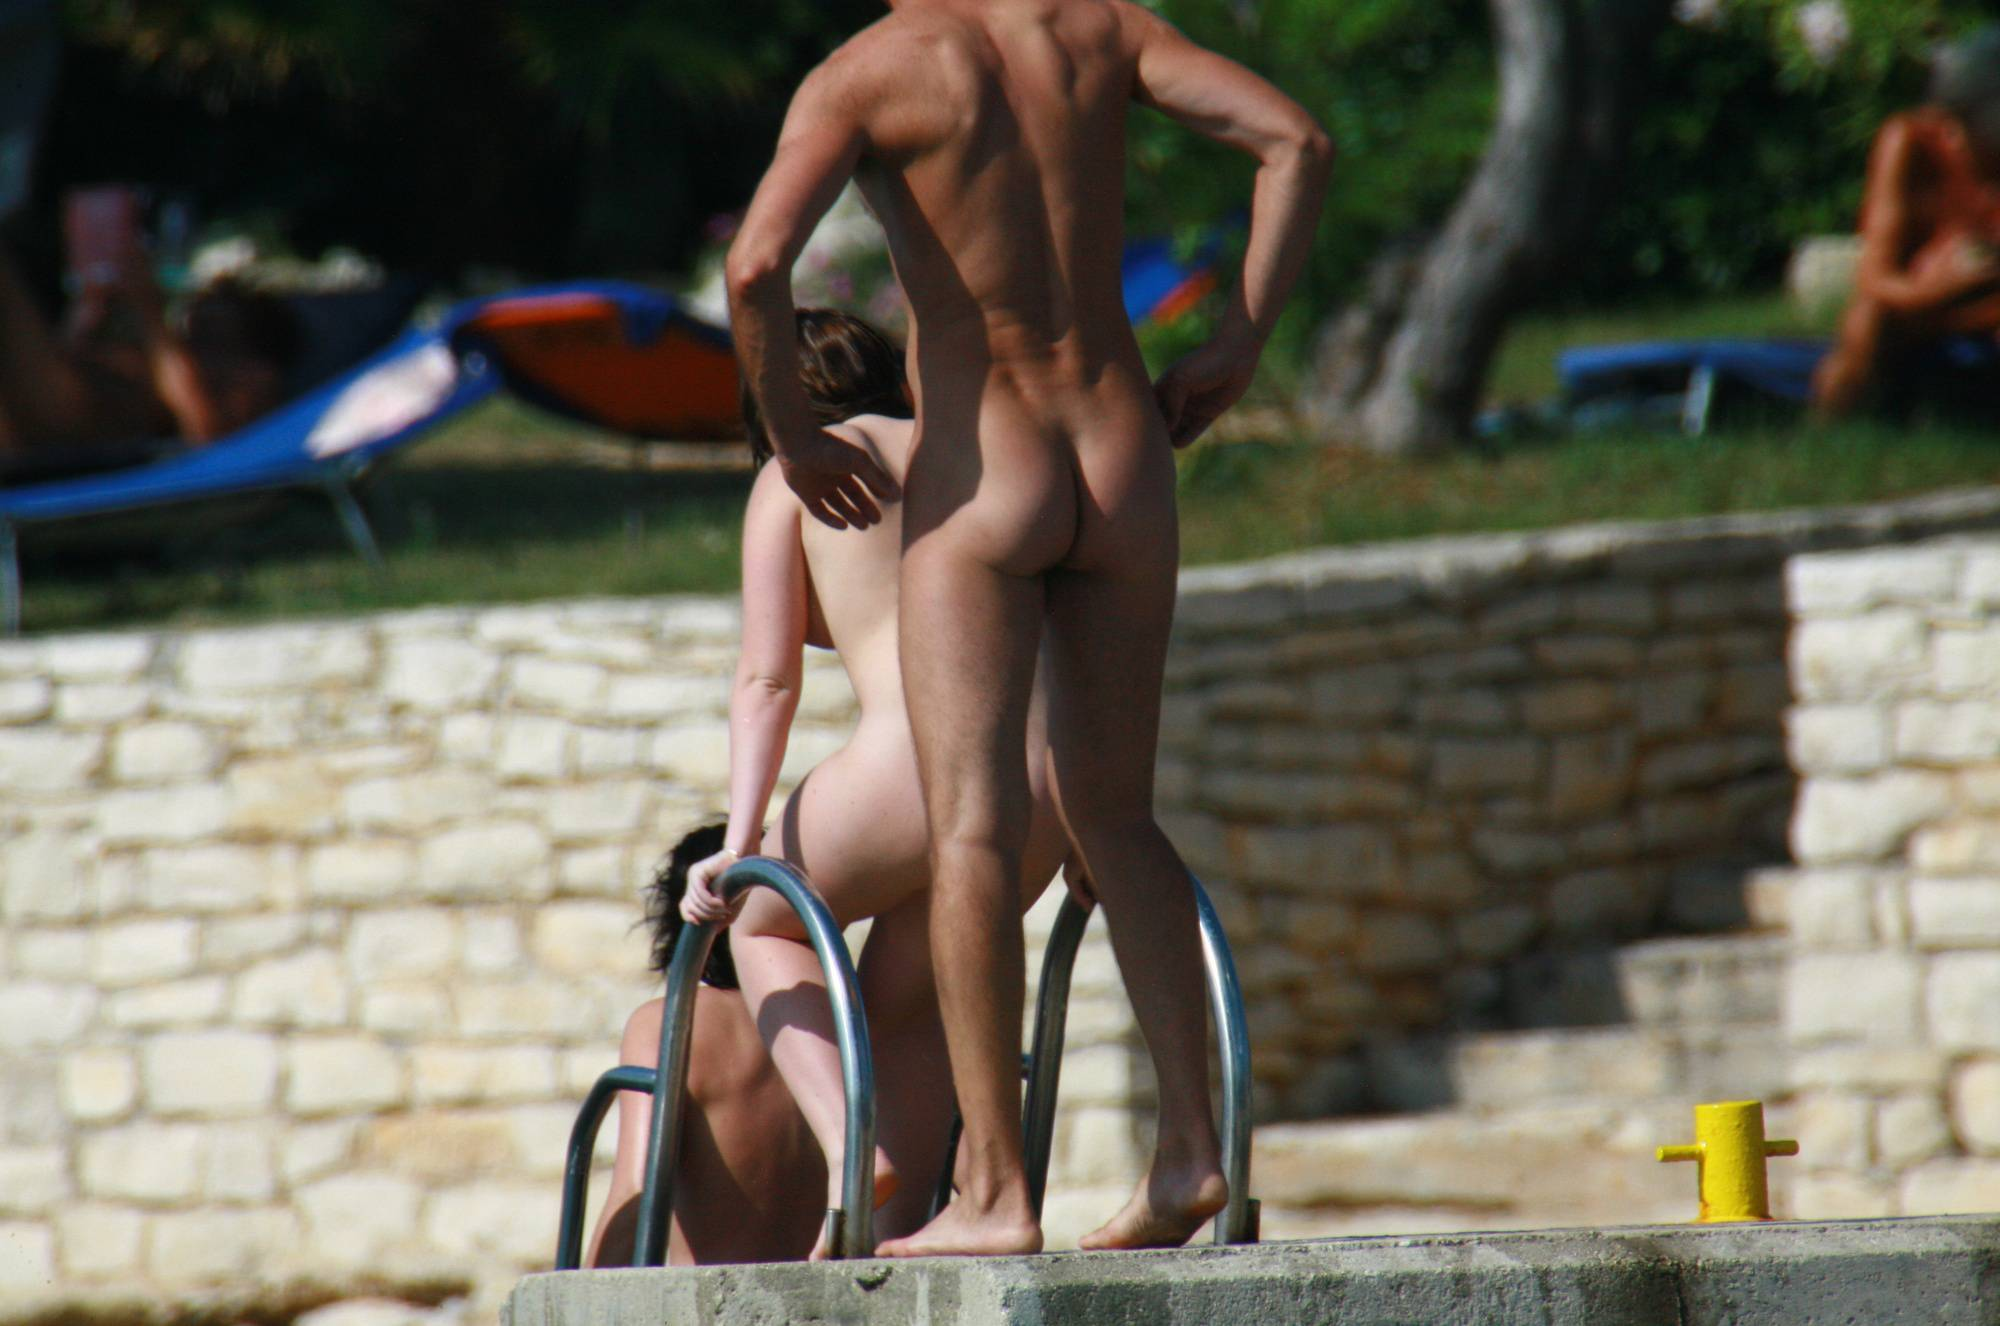 Purenudism Photos-Nudist Girl Daytime Walk - 1